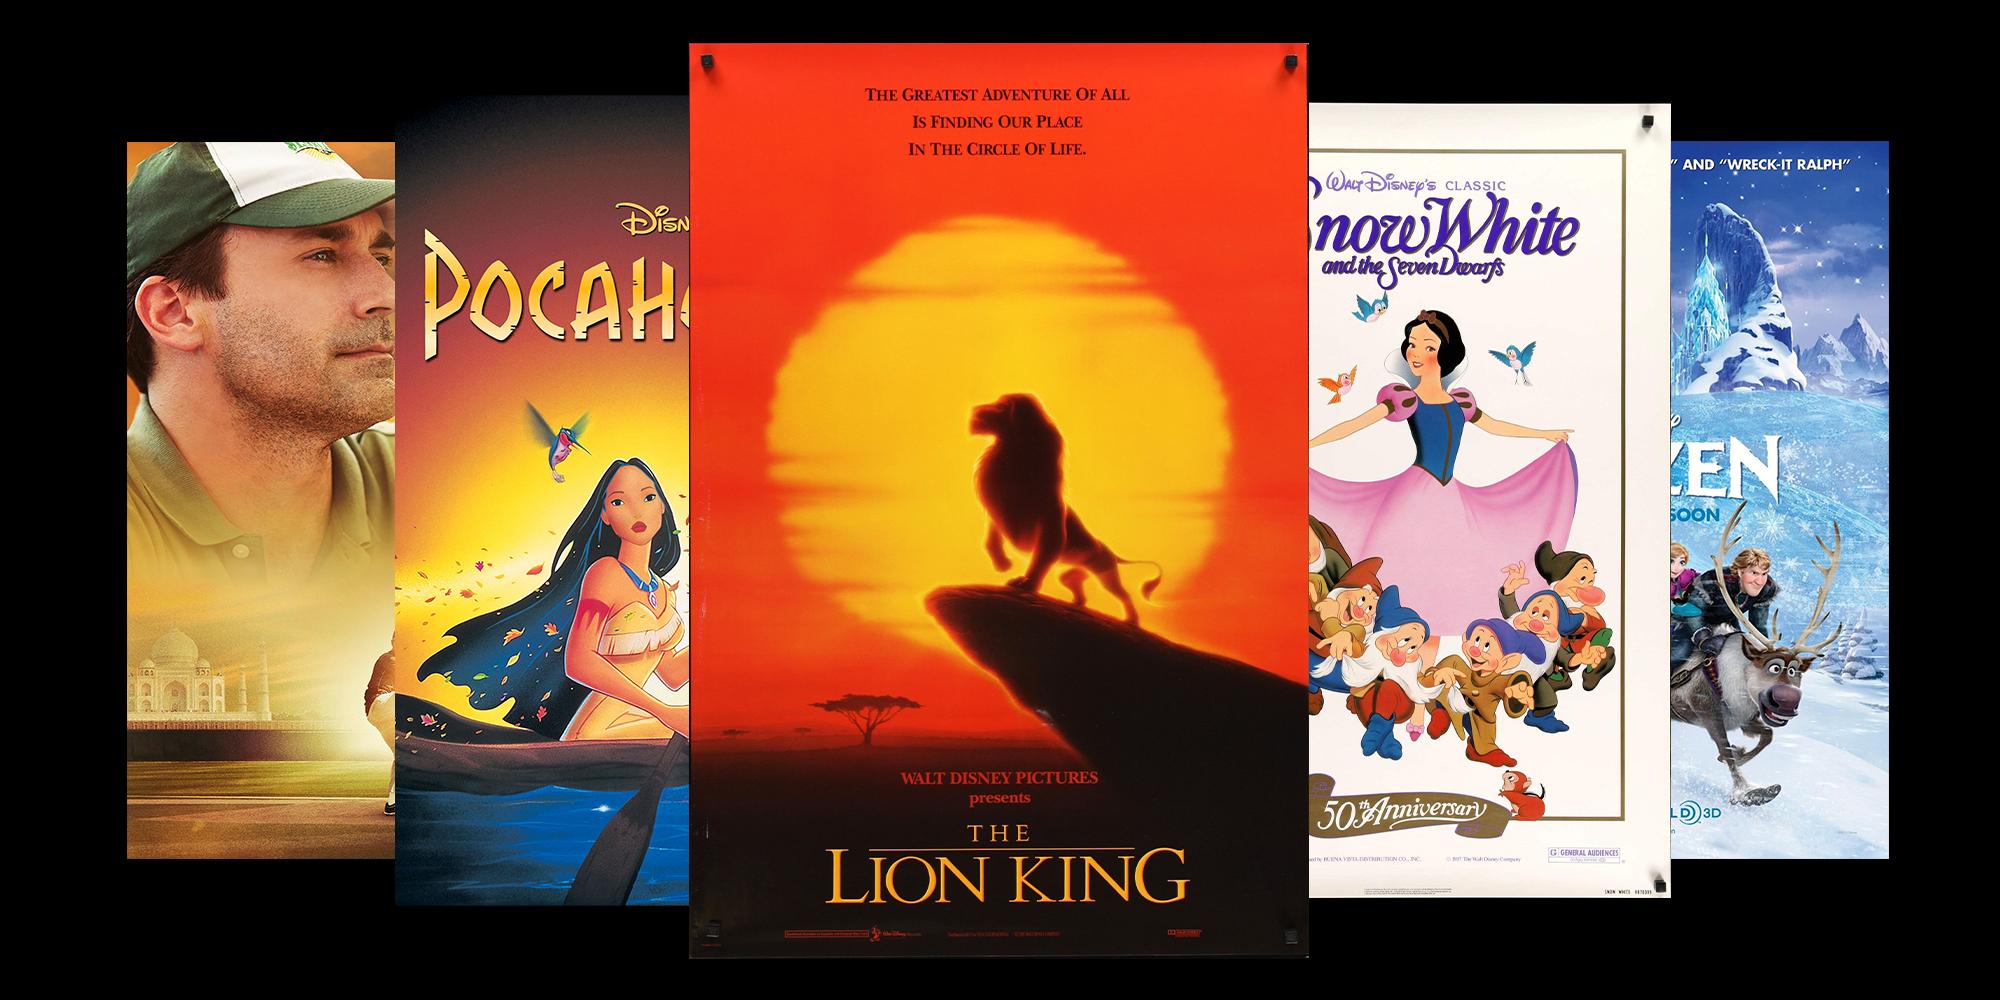 This week's best iTunes movie deals: $15 Disney titles, 4K films from $5, $1 rental, more